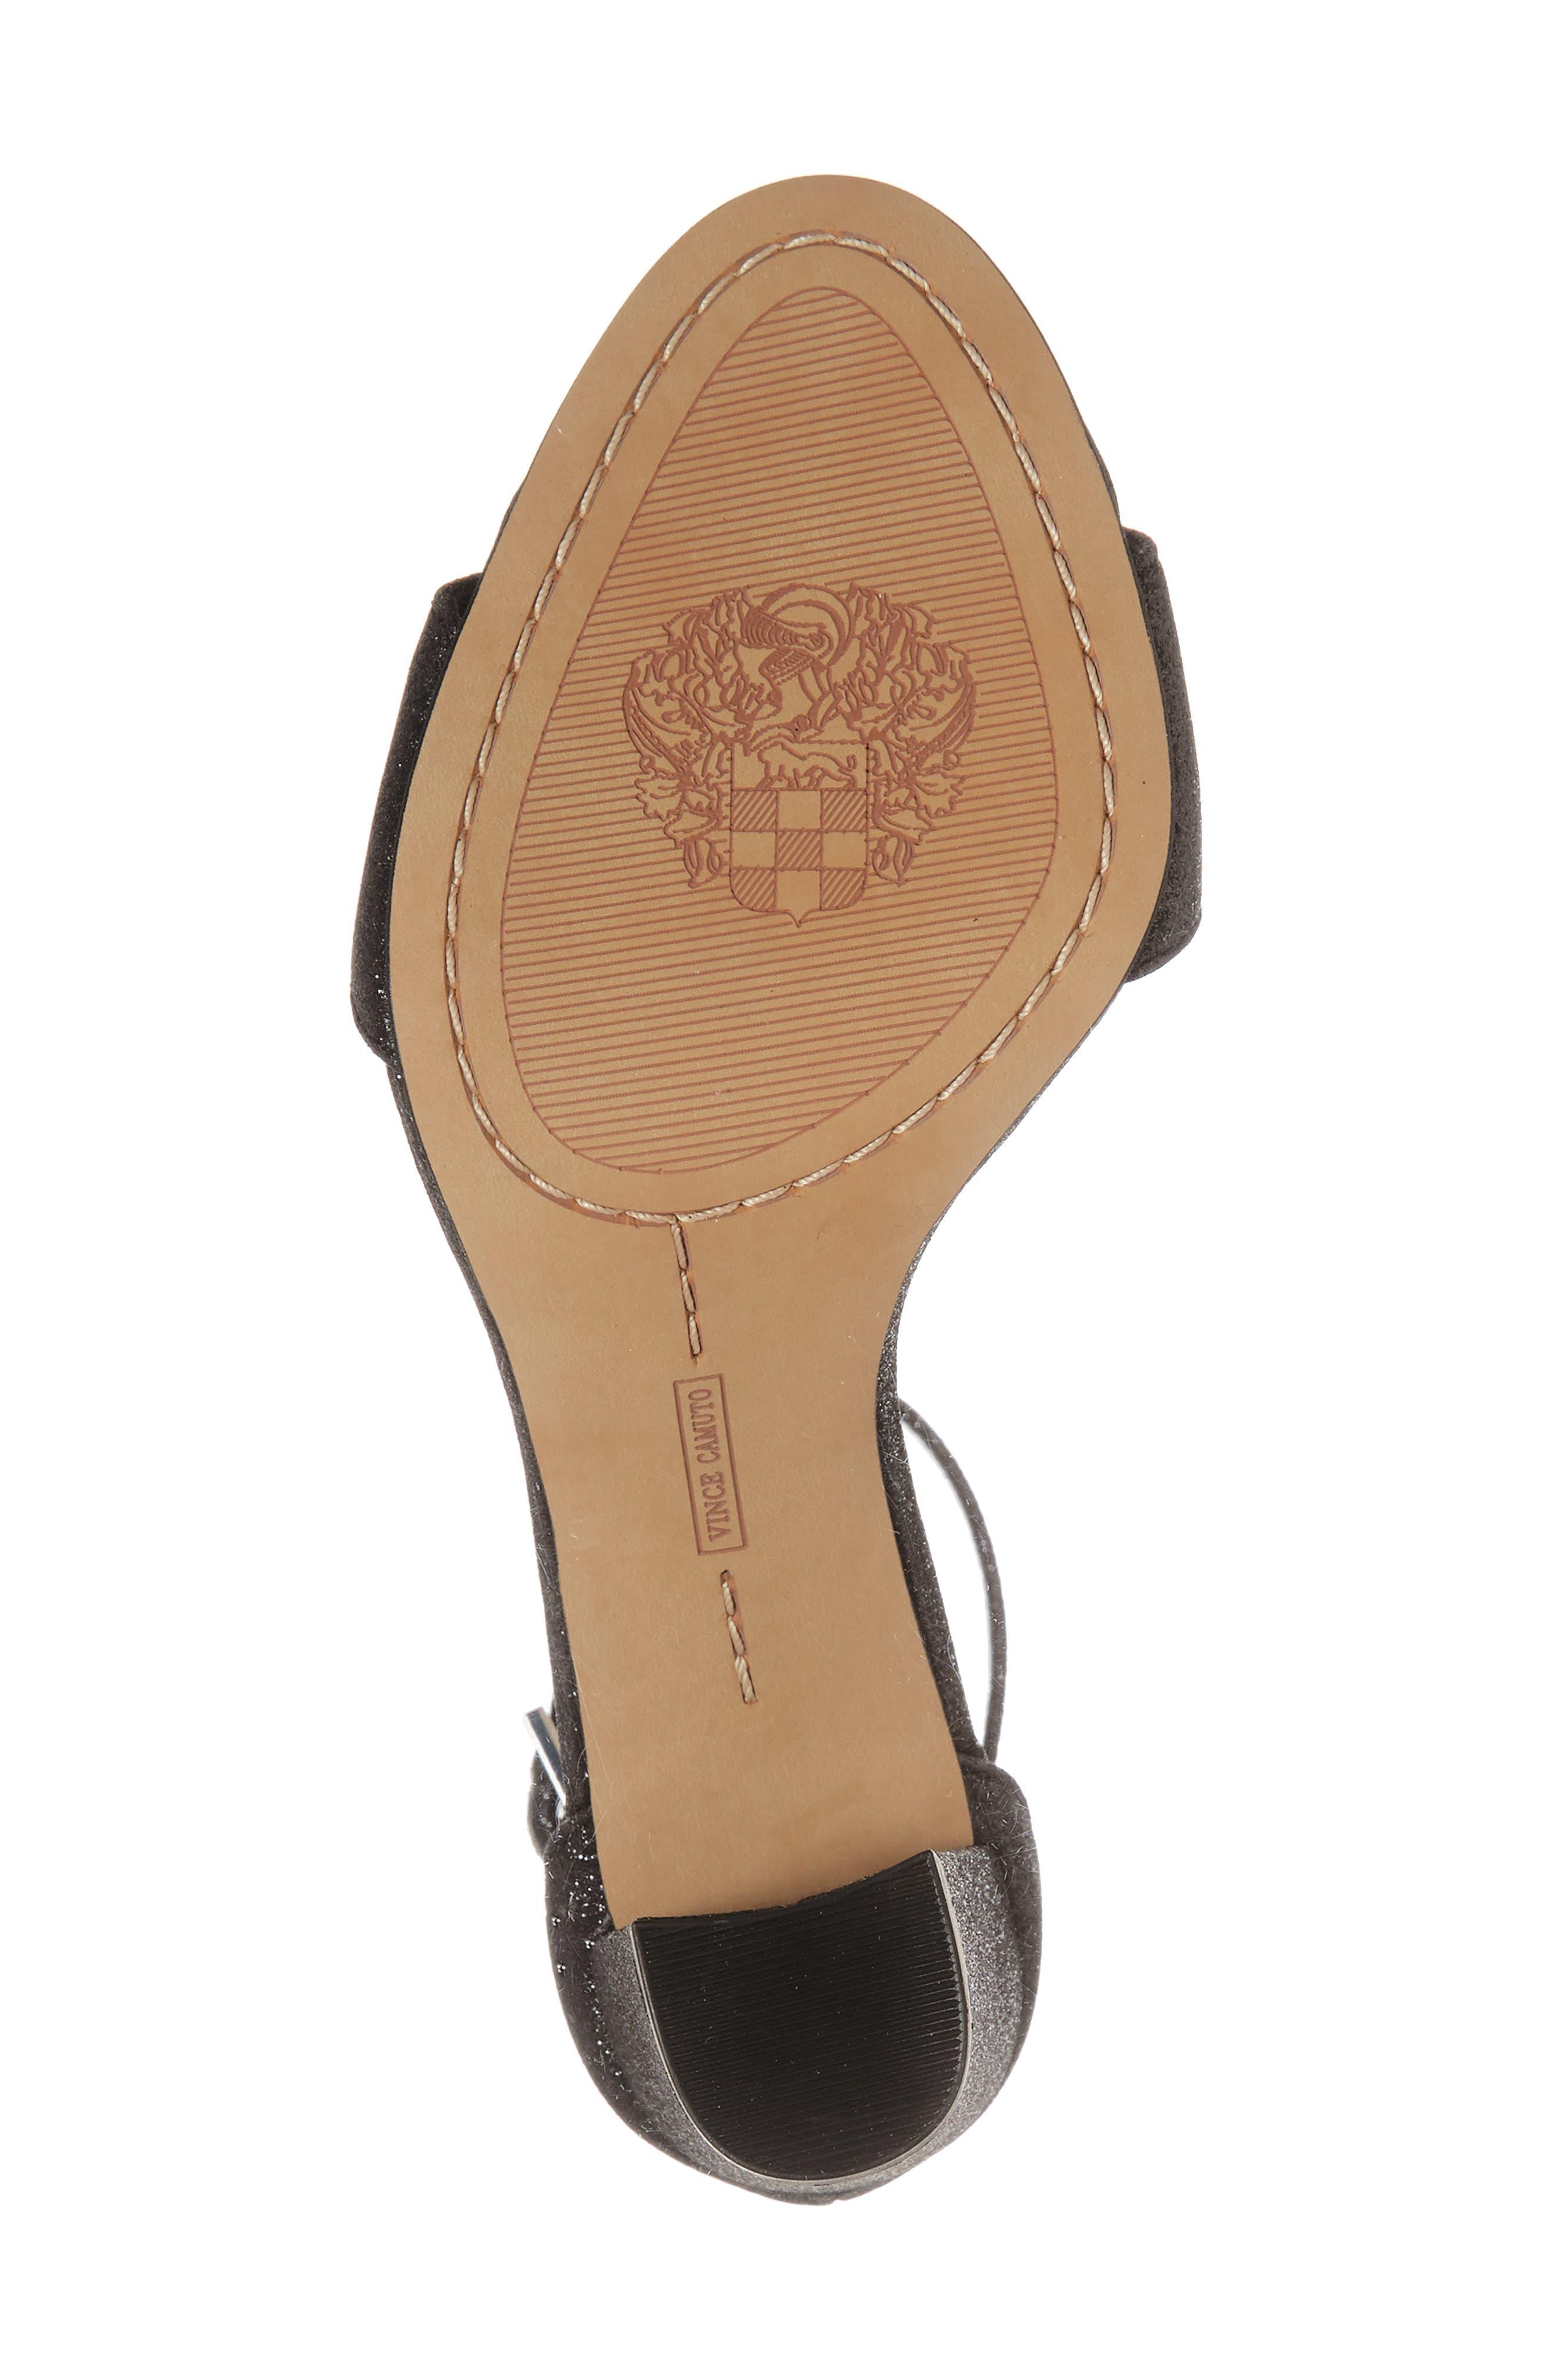 Corlina Ankle Strap Sandal,                             Alternate thumbnail 4, color,                             Black Glitter Fabric